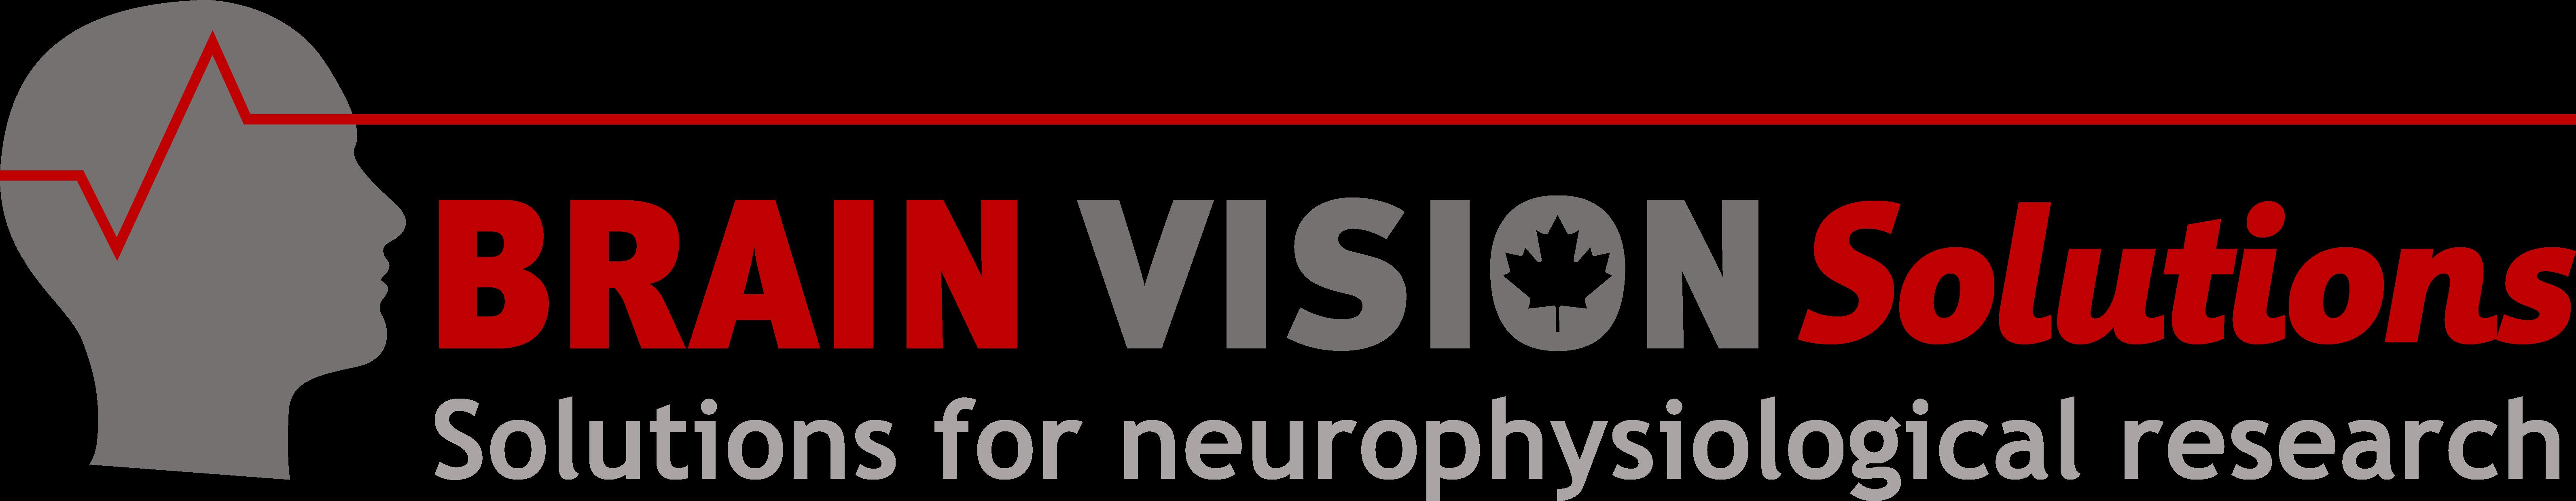 Brain Vision Solutions Webshop